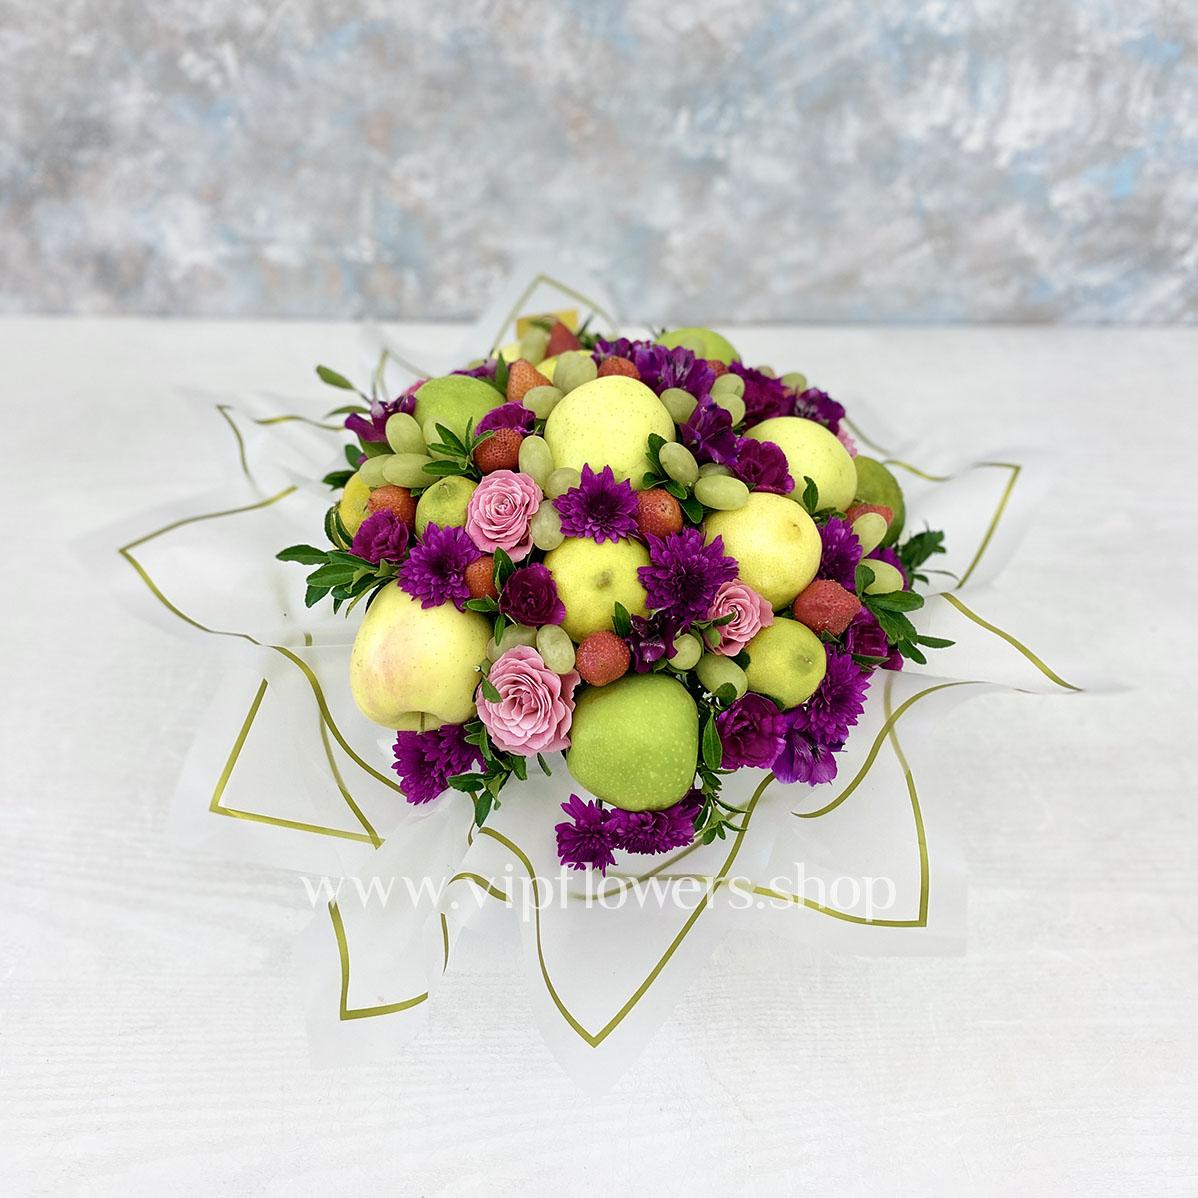 گل و میوه- گلفروشی آنلاین VIP Shop